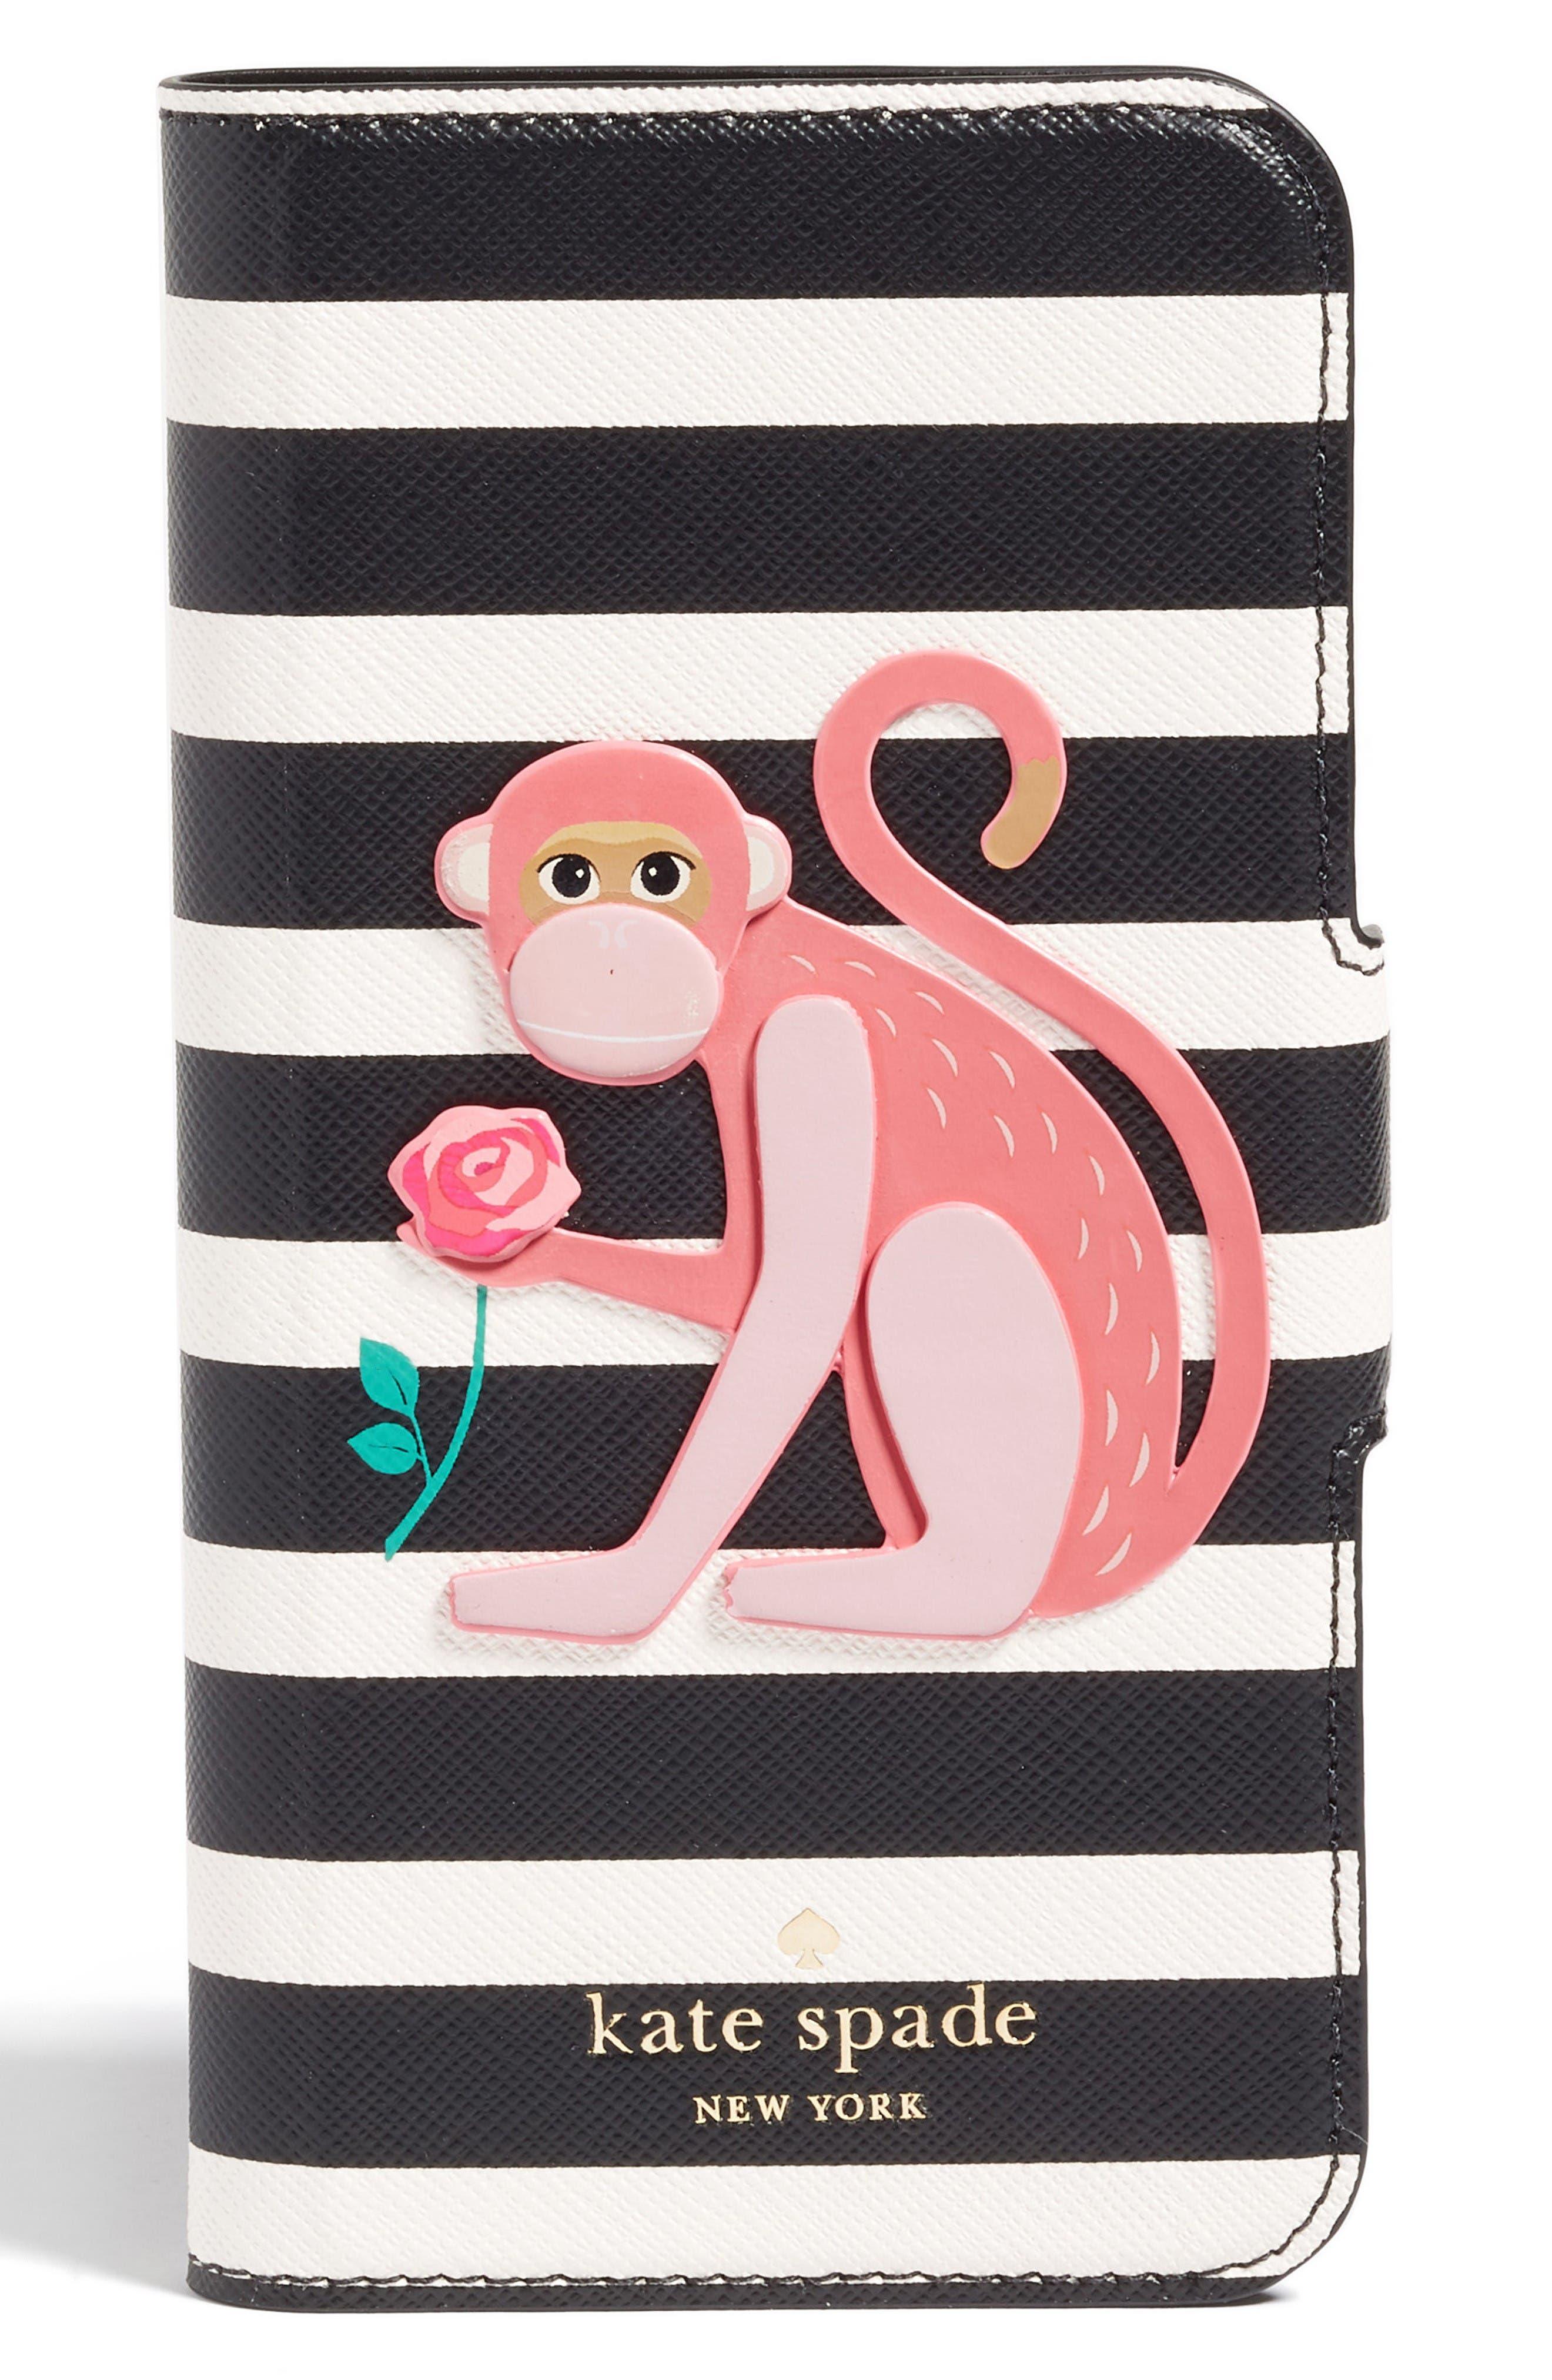 KATE SPADE NEW YORK monkey appliqué iPhone 7